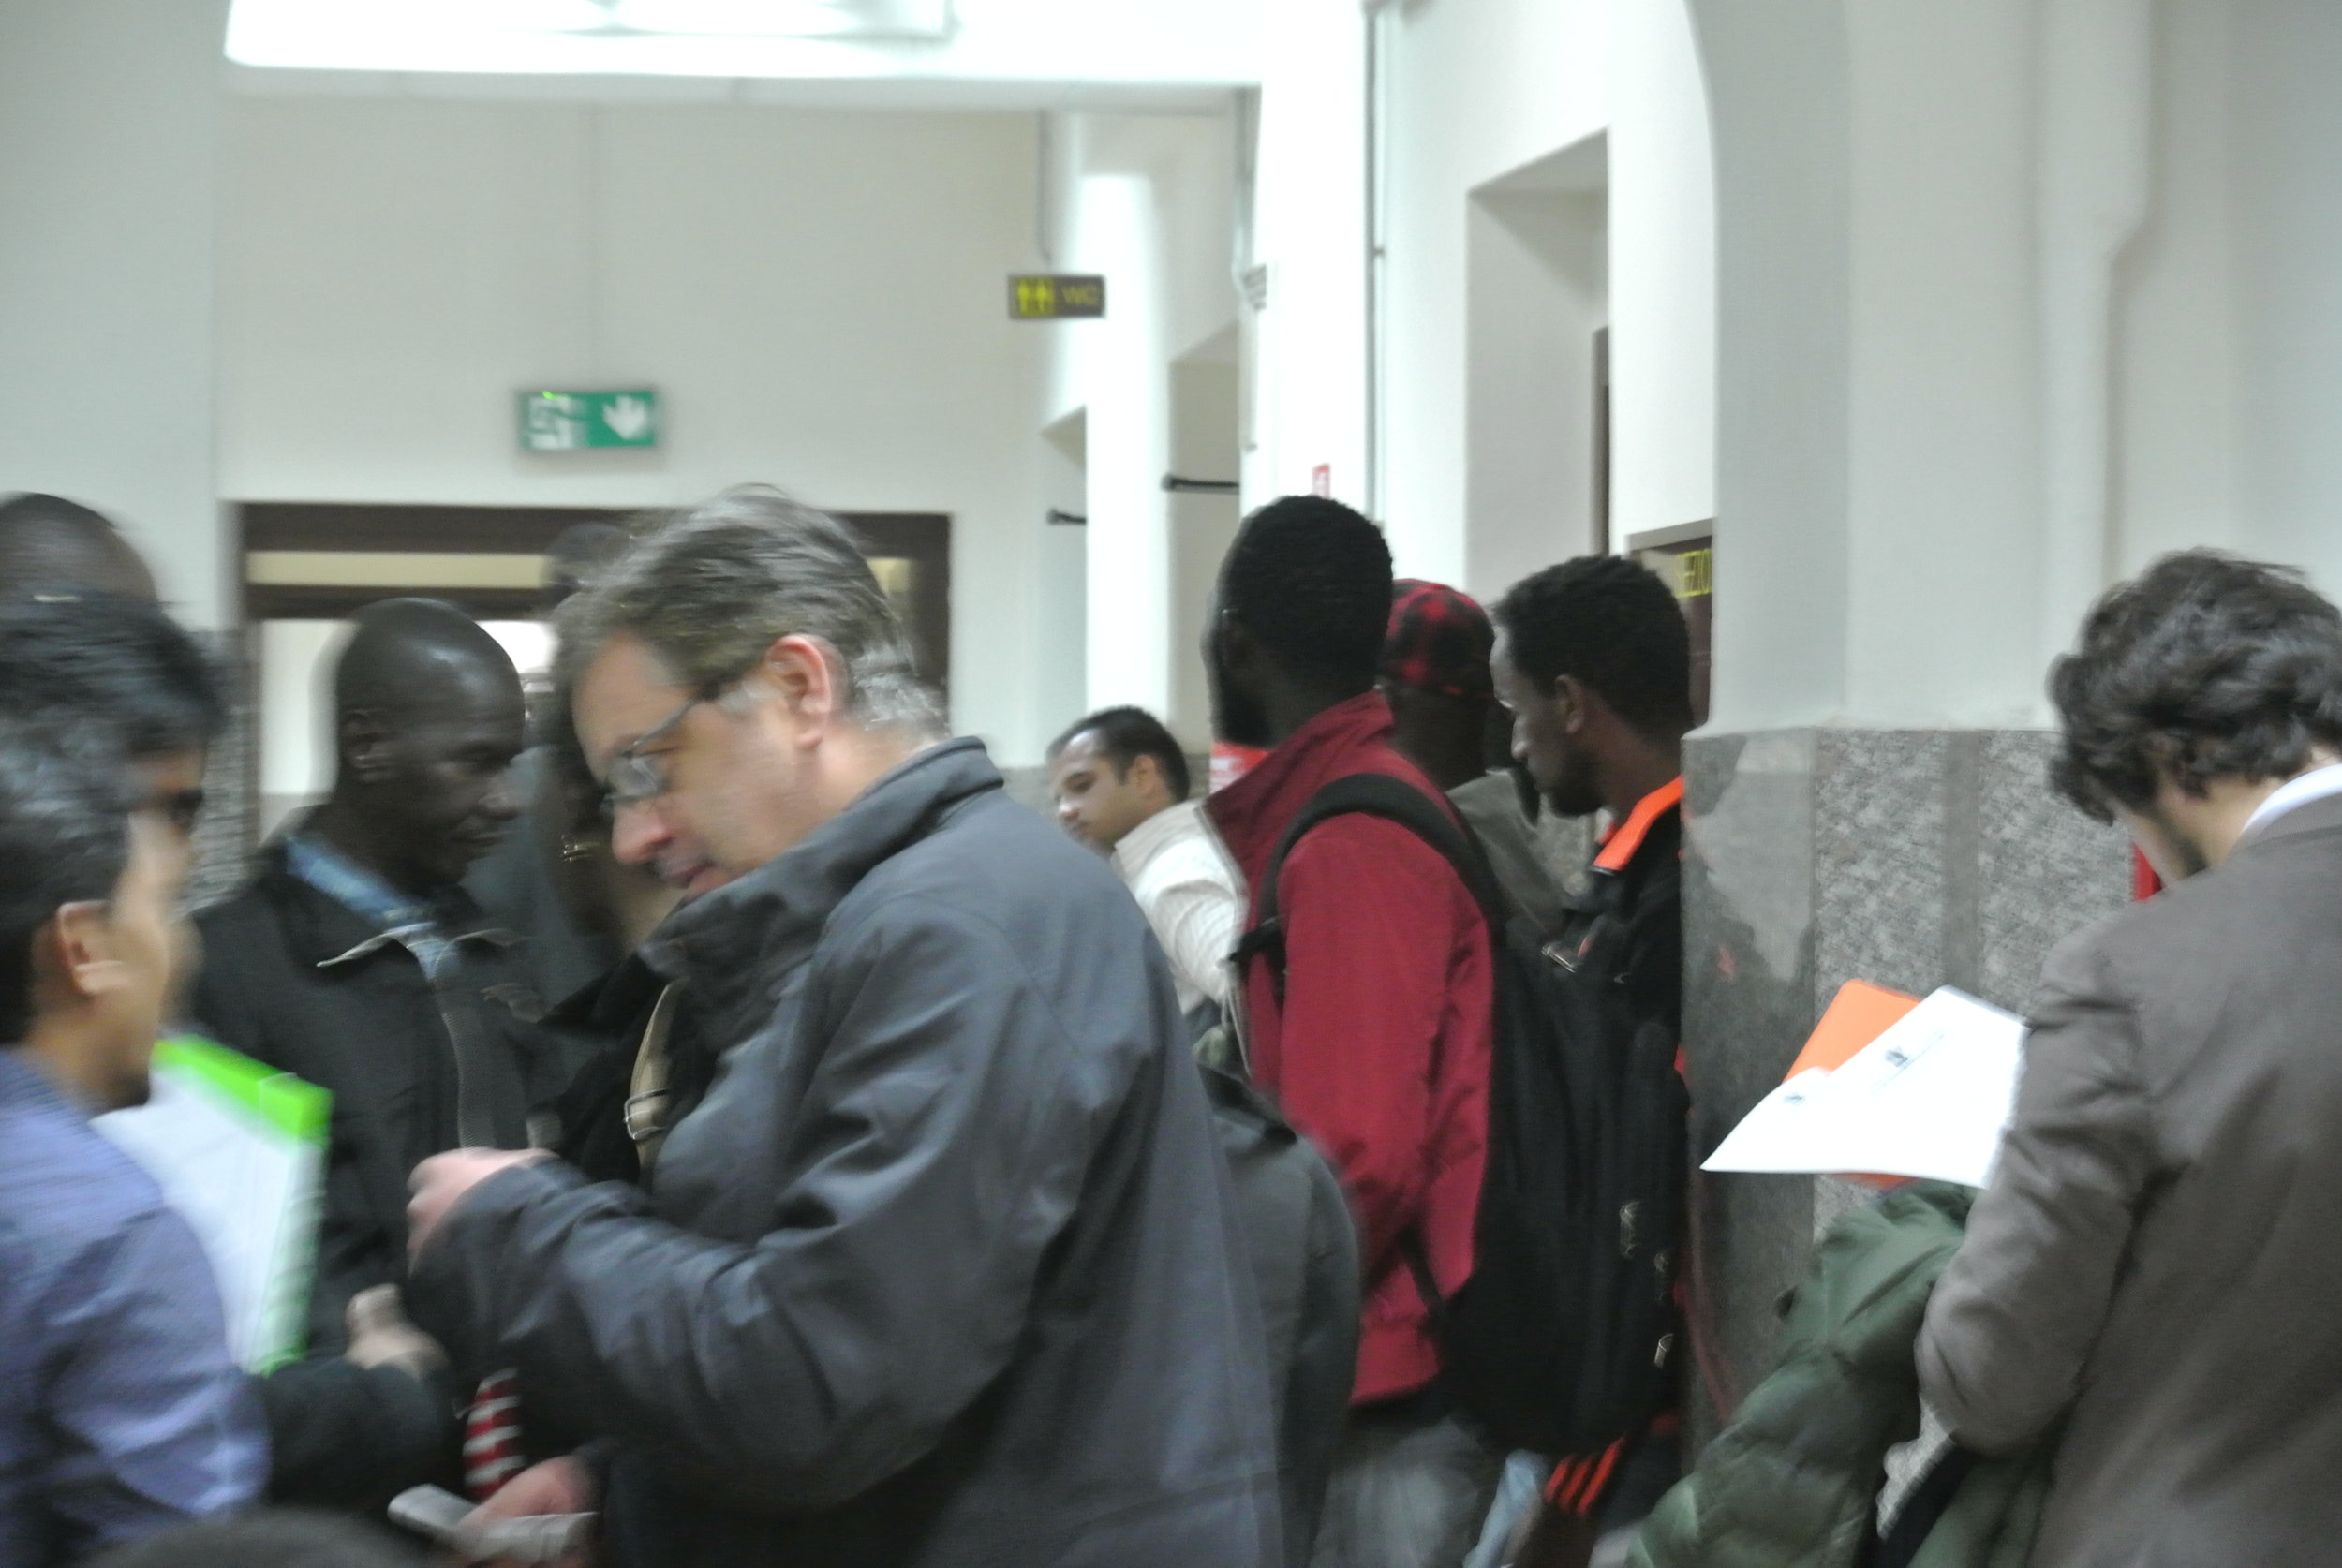 The chaotic corridor at the  Tribunale . Rome, Italy; 24 April 2018. © Pamela Kerpius